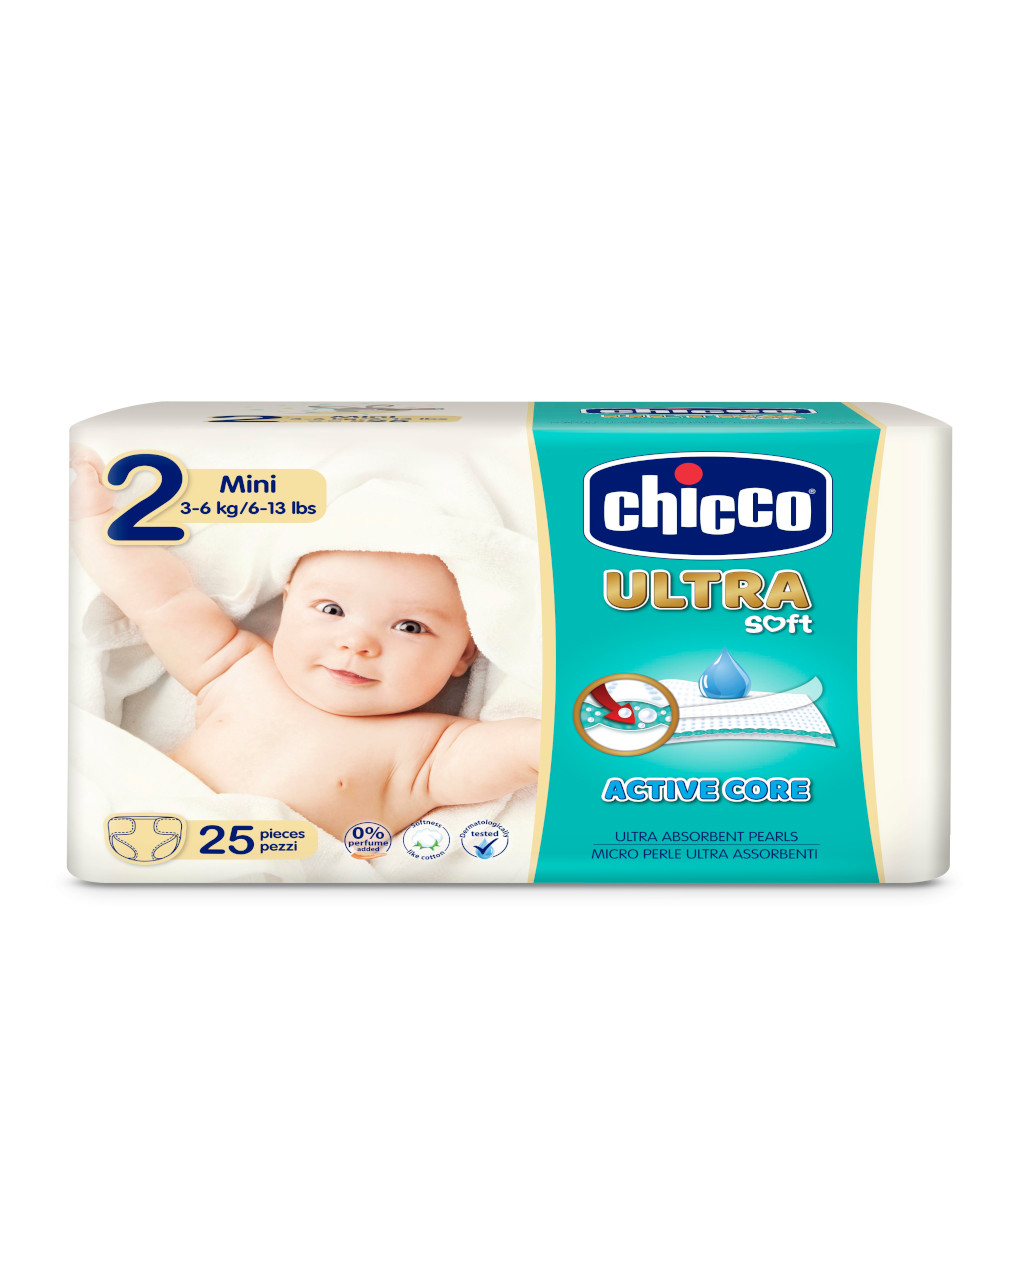 Chicco - pannolini ultra soft tg. 2 (3-6 kg) - pacco singolo 25 pz - Chicco